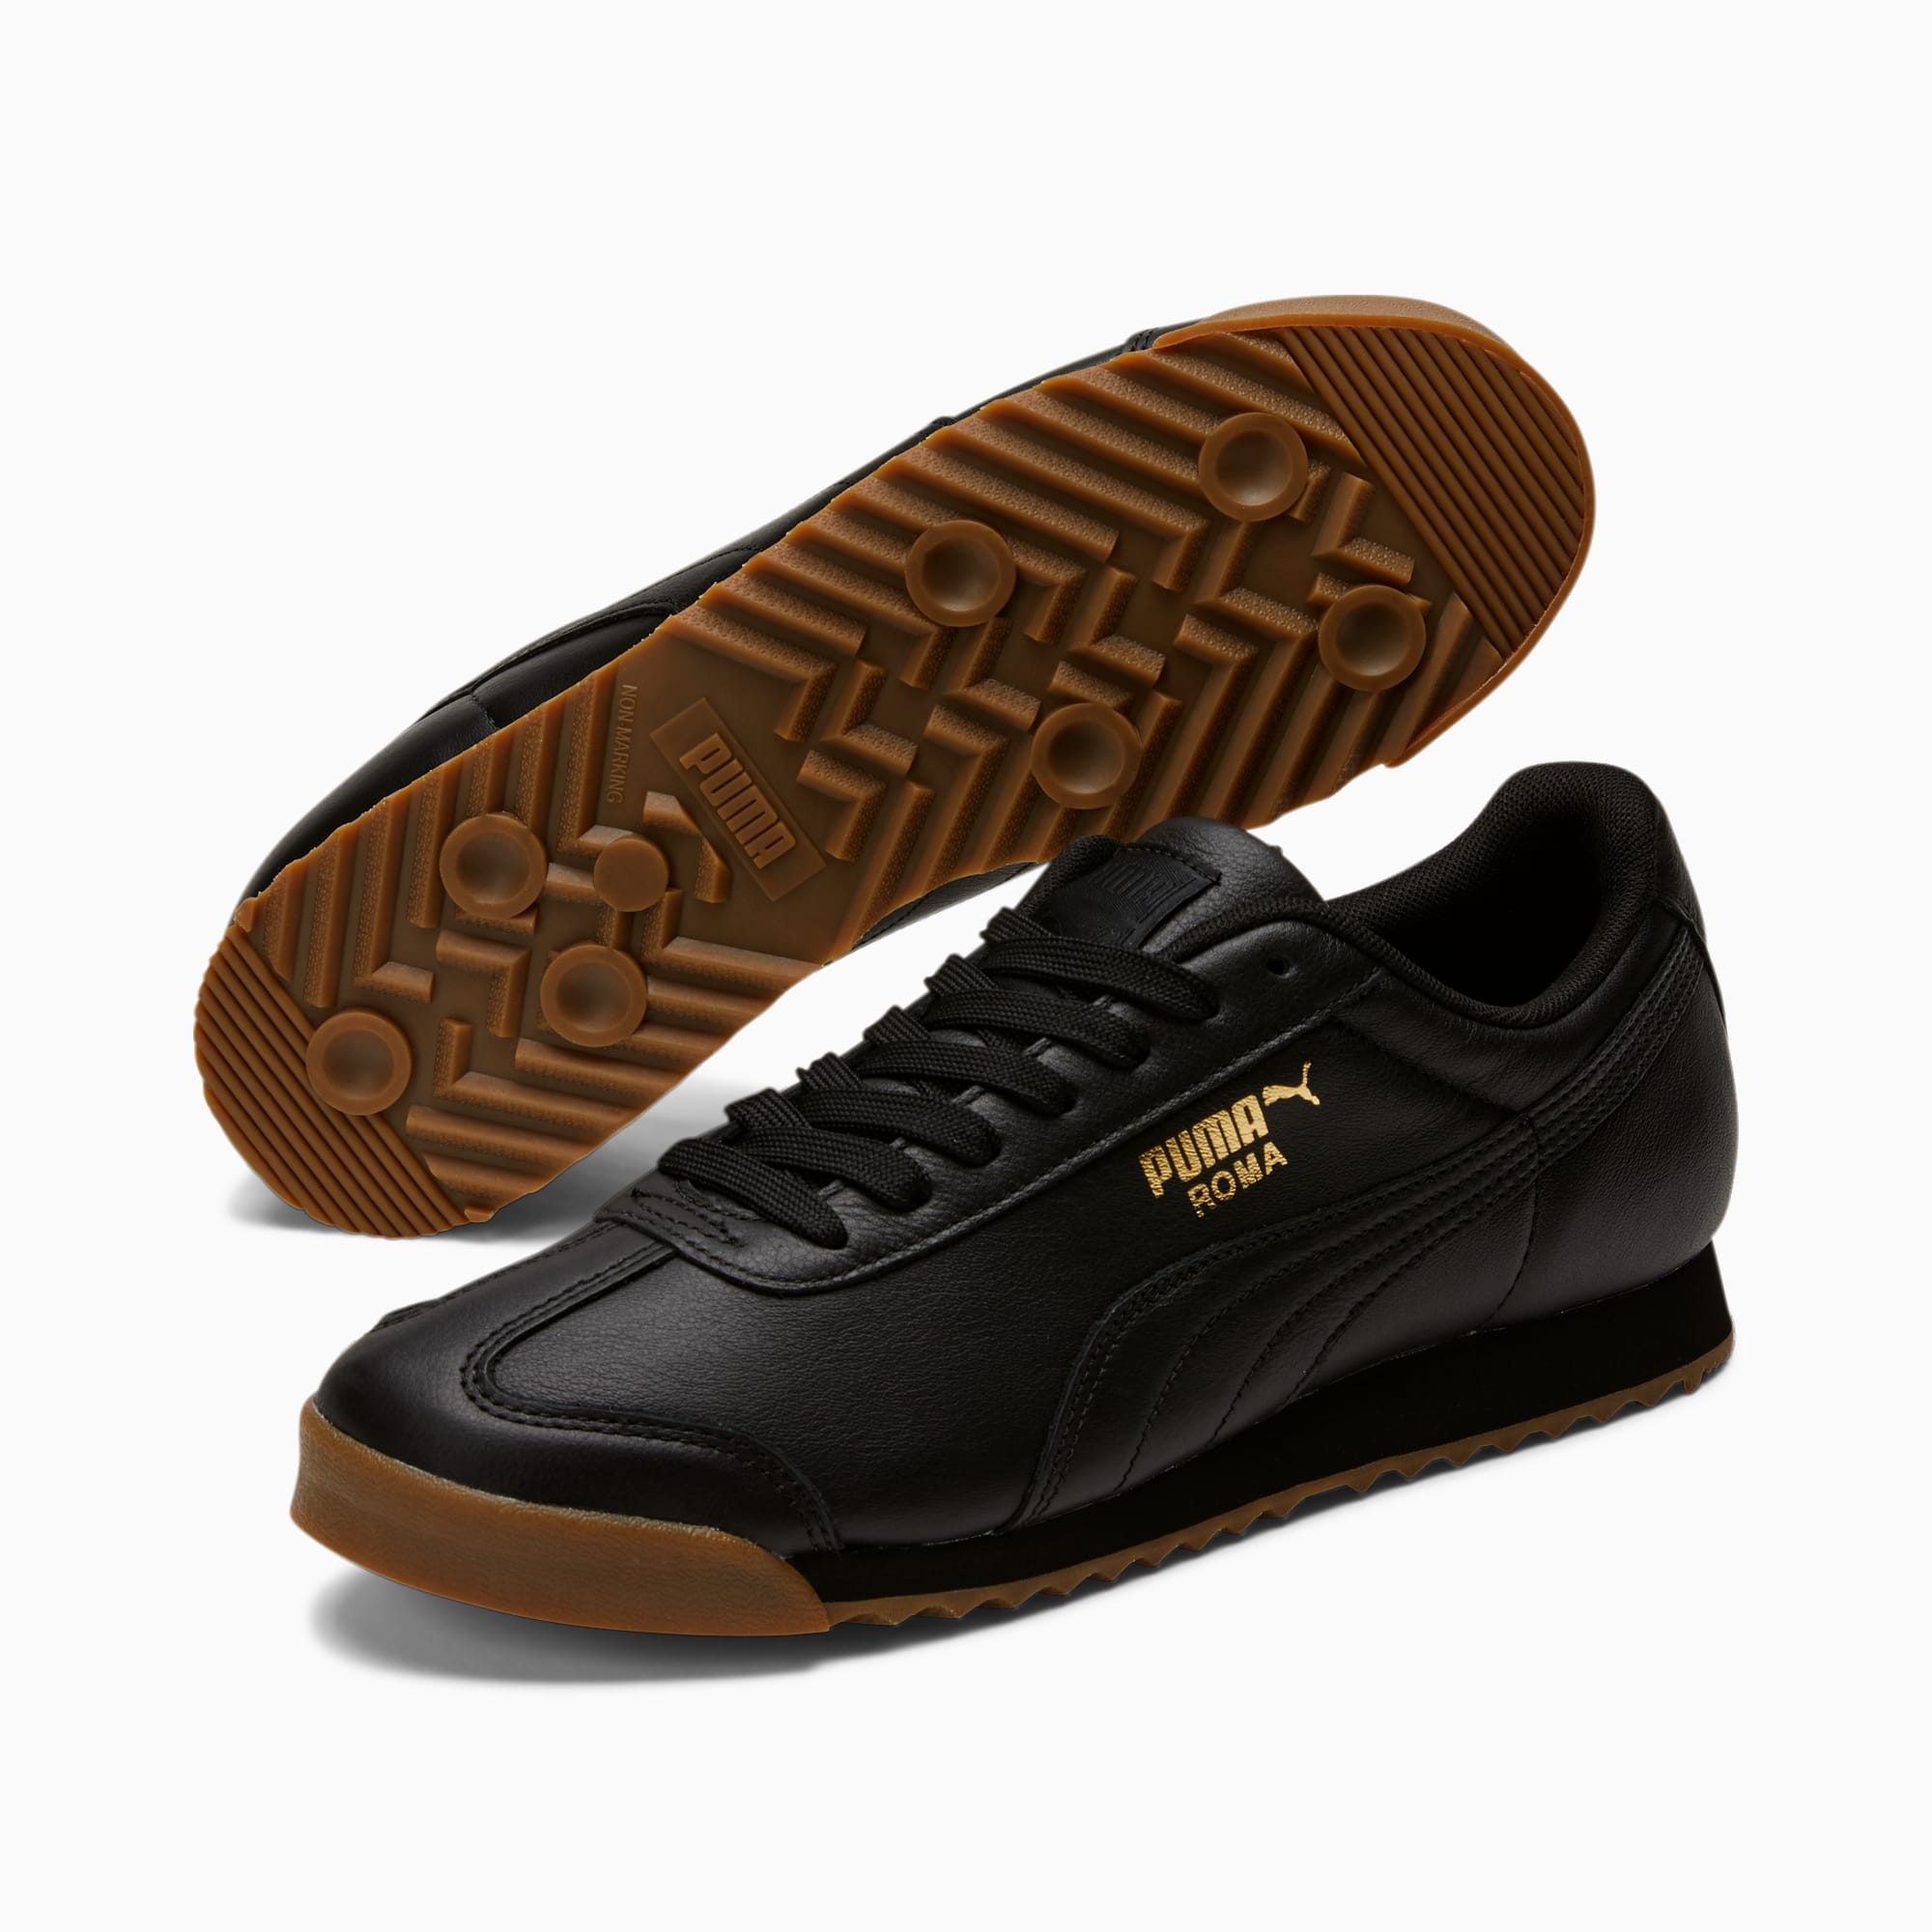 puma gum sole shoes